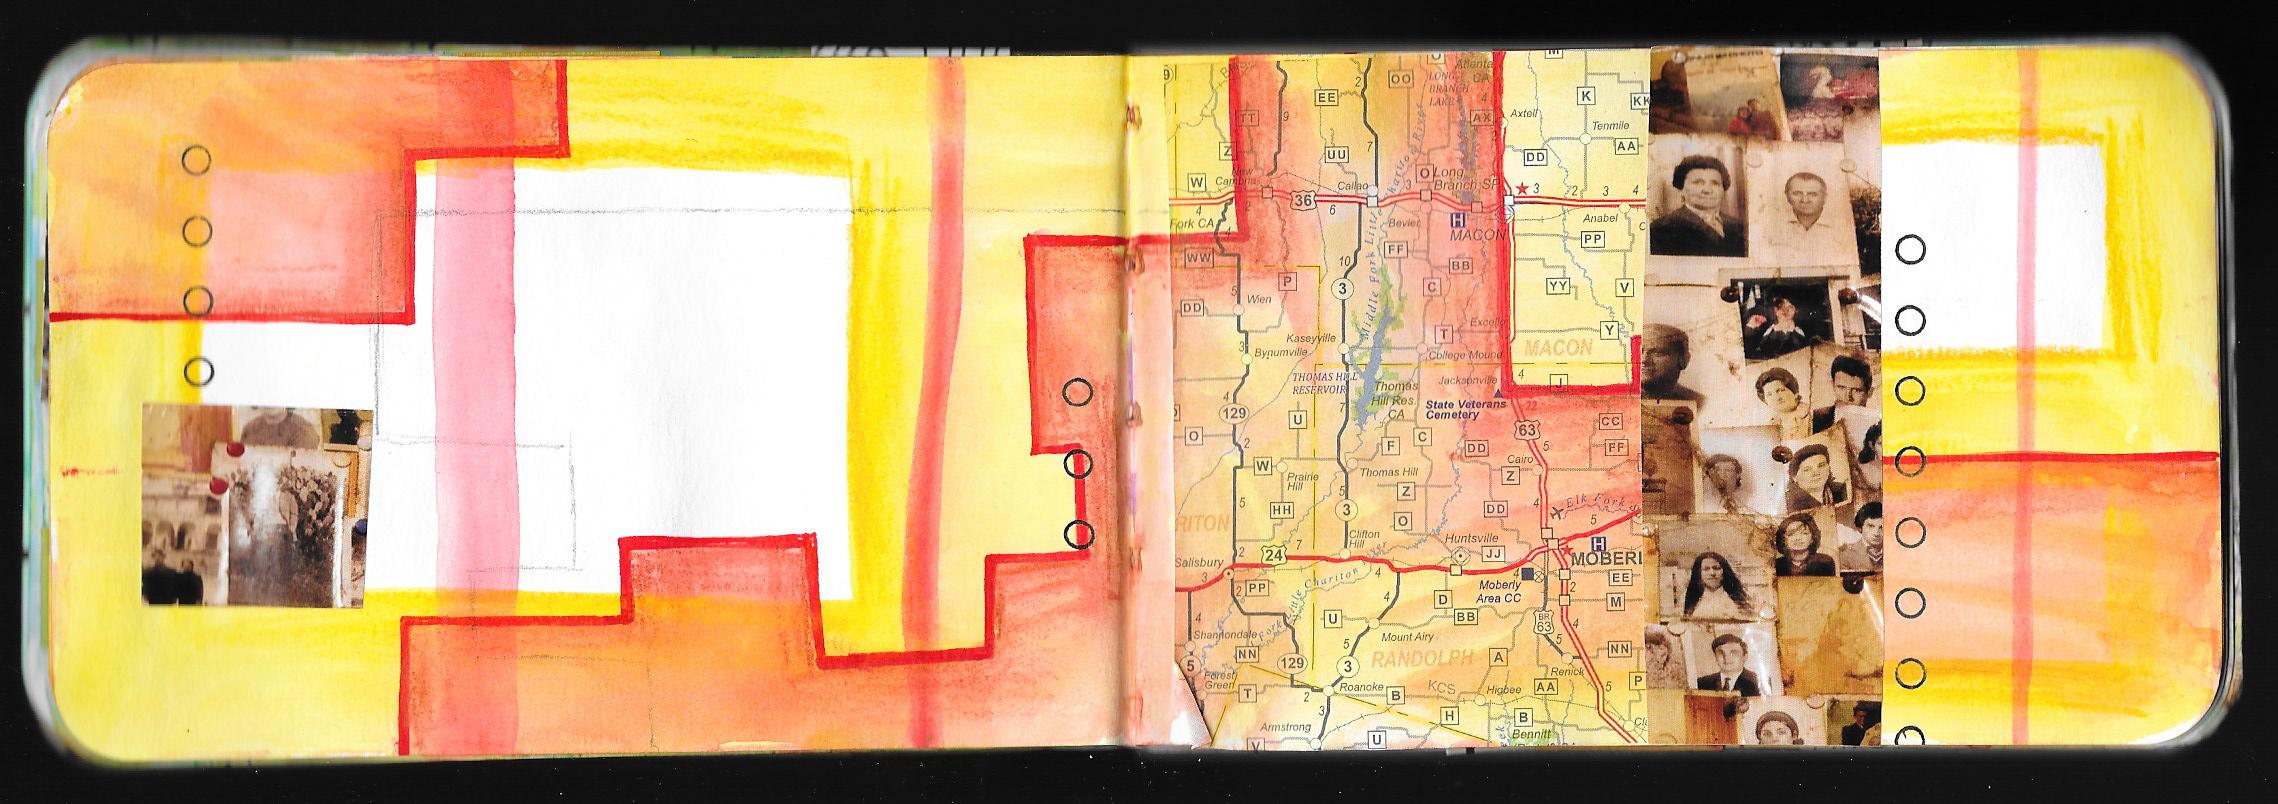 CPB Collage 3.jpeg